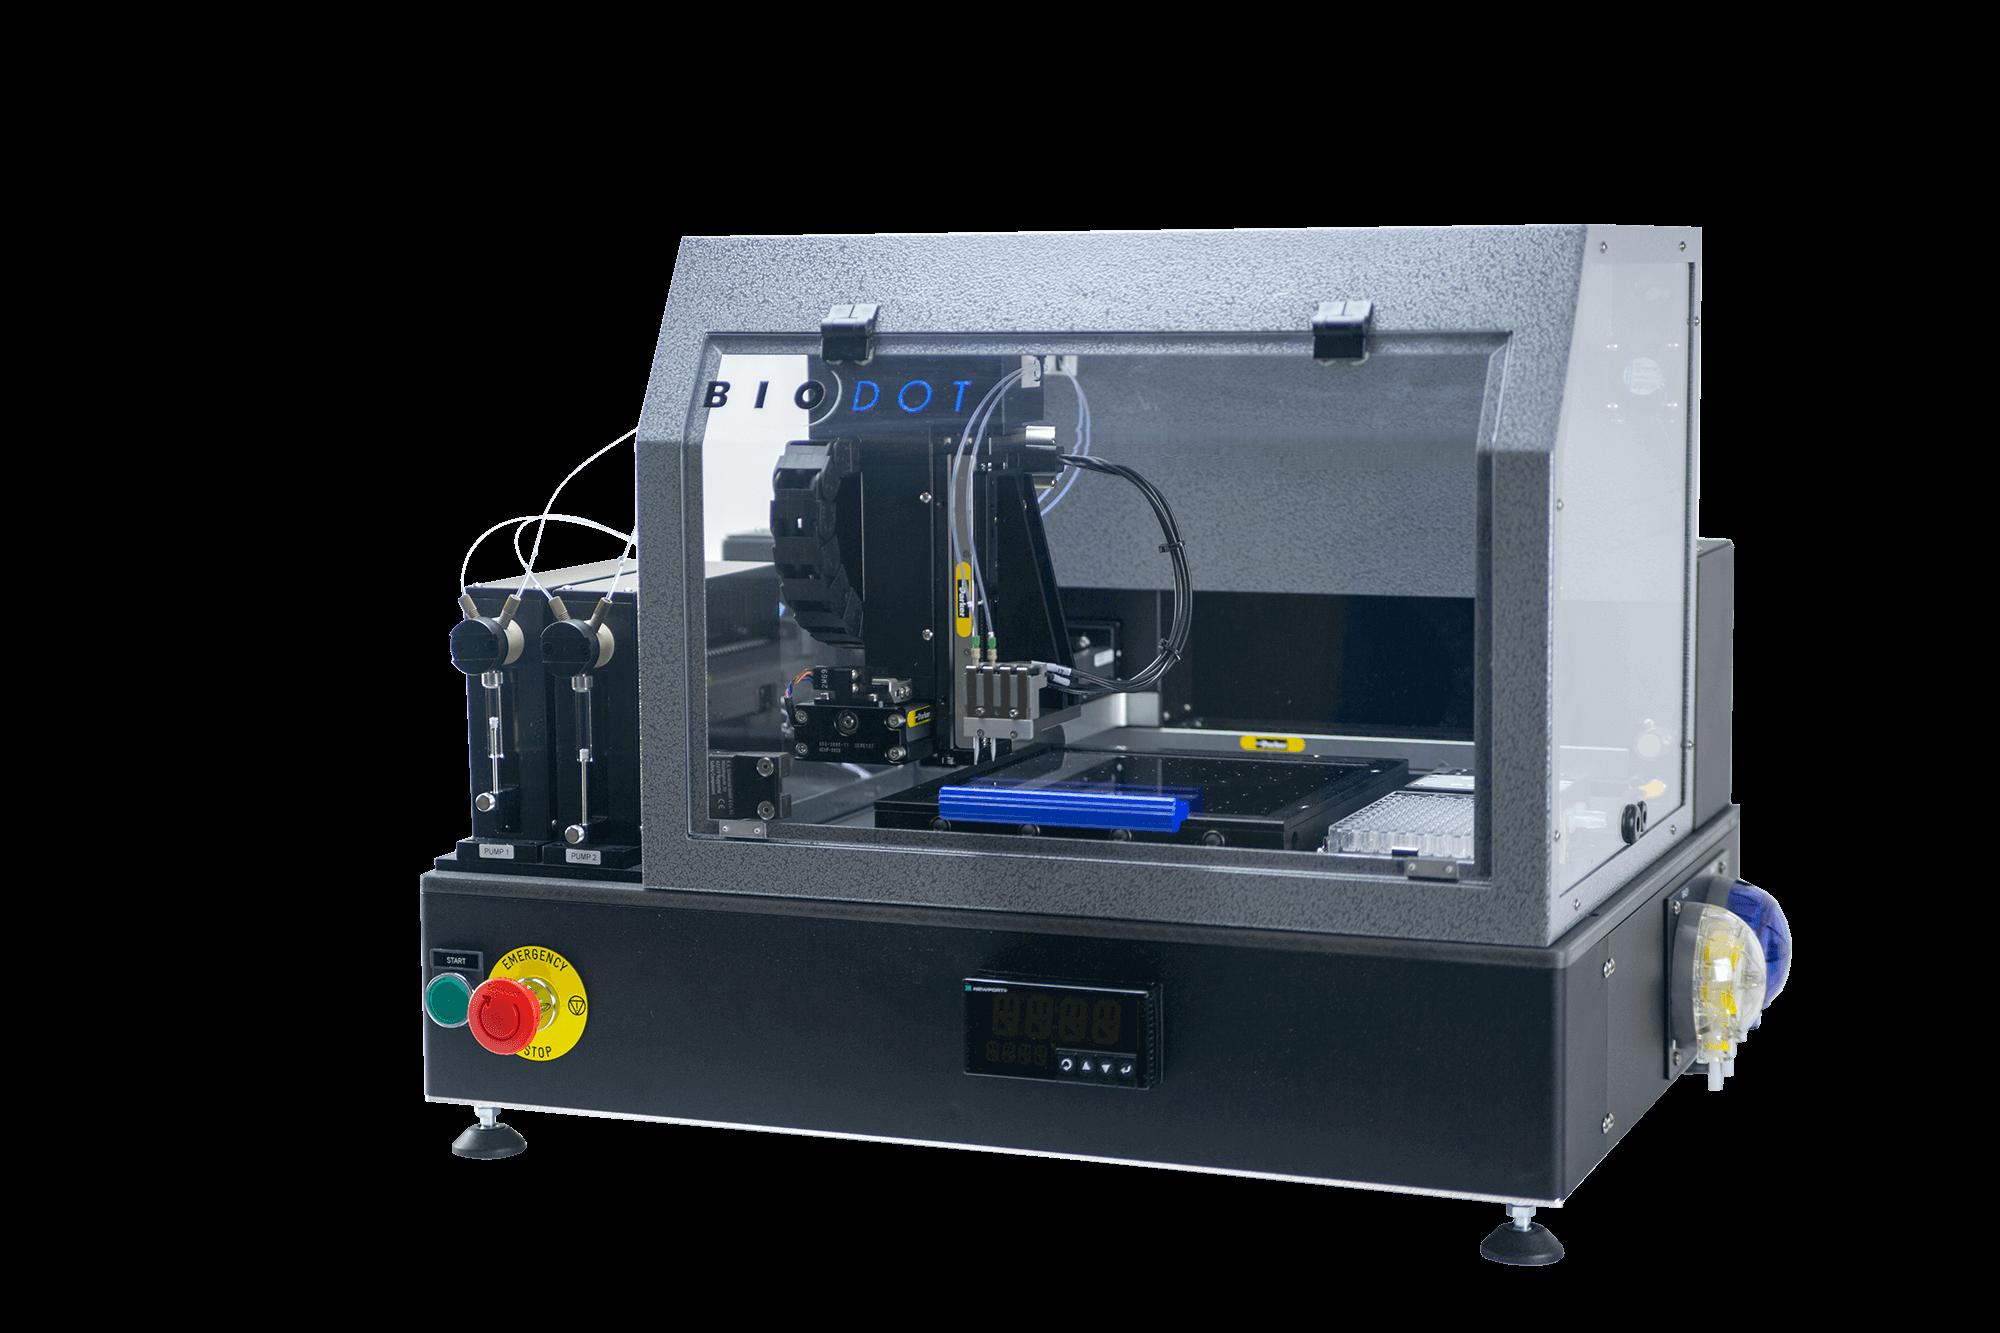 AD1520™ Aspirate Dispense System